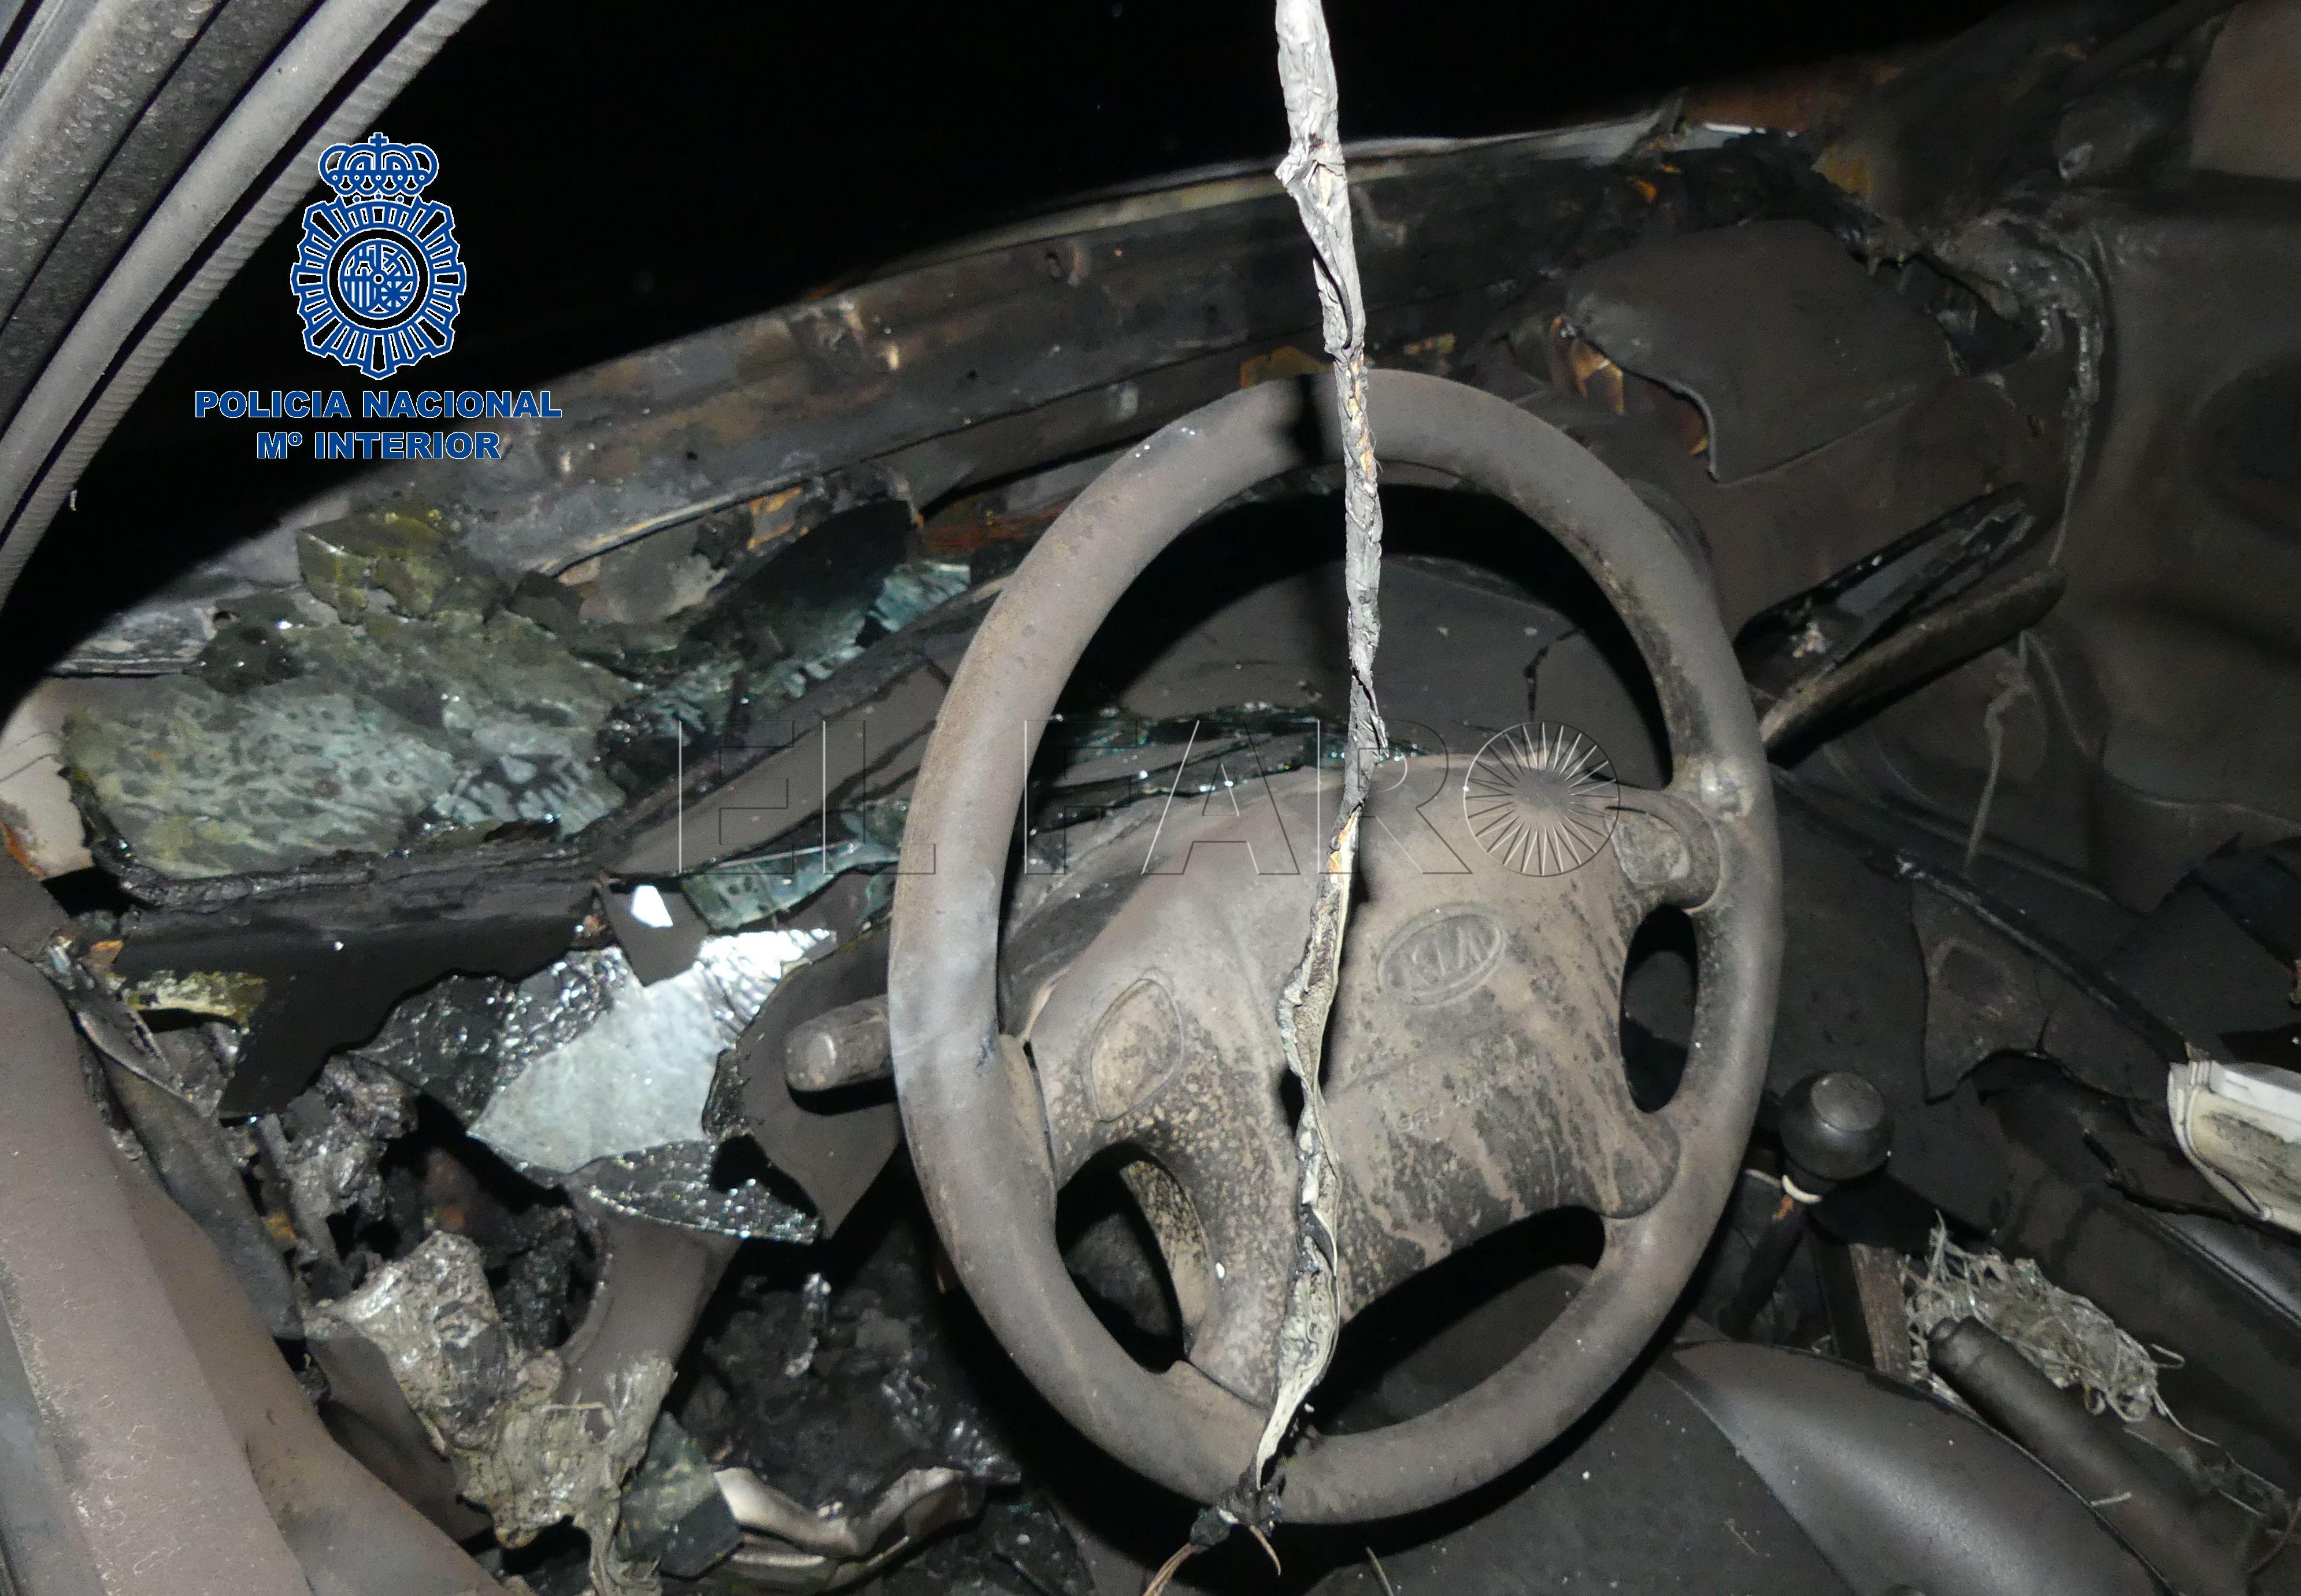 7a31ebc7e En libertad el detenido por la quema de un coche en Miramar